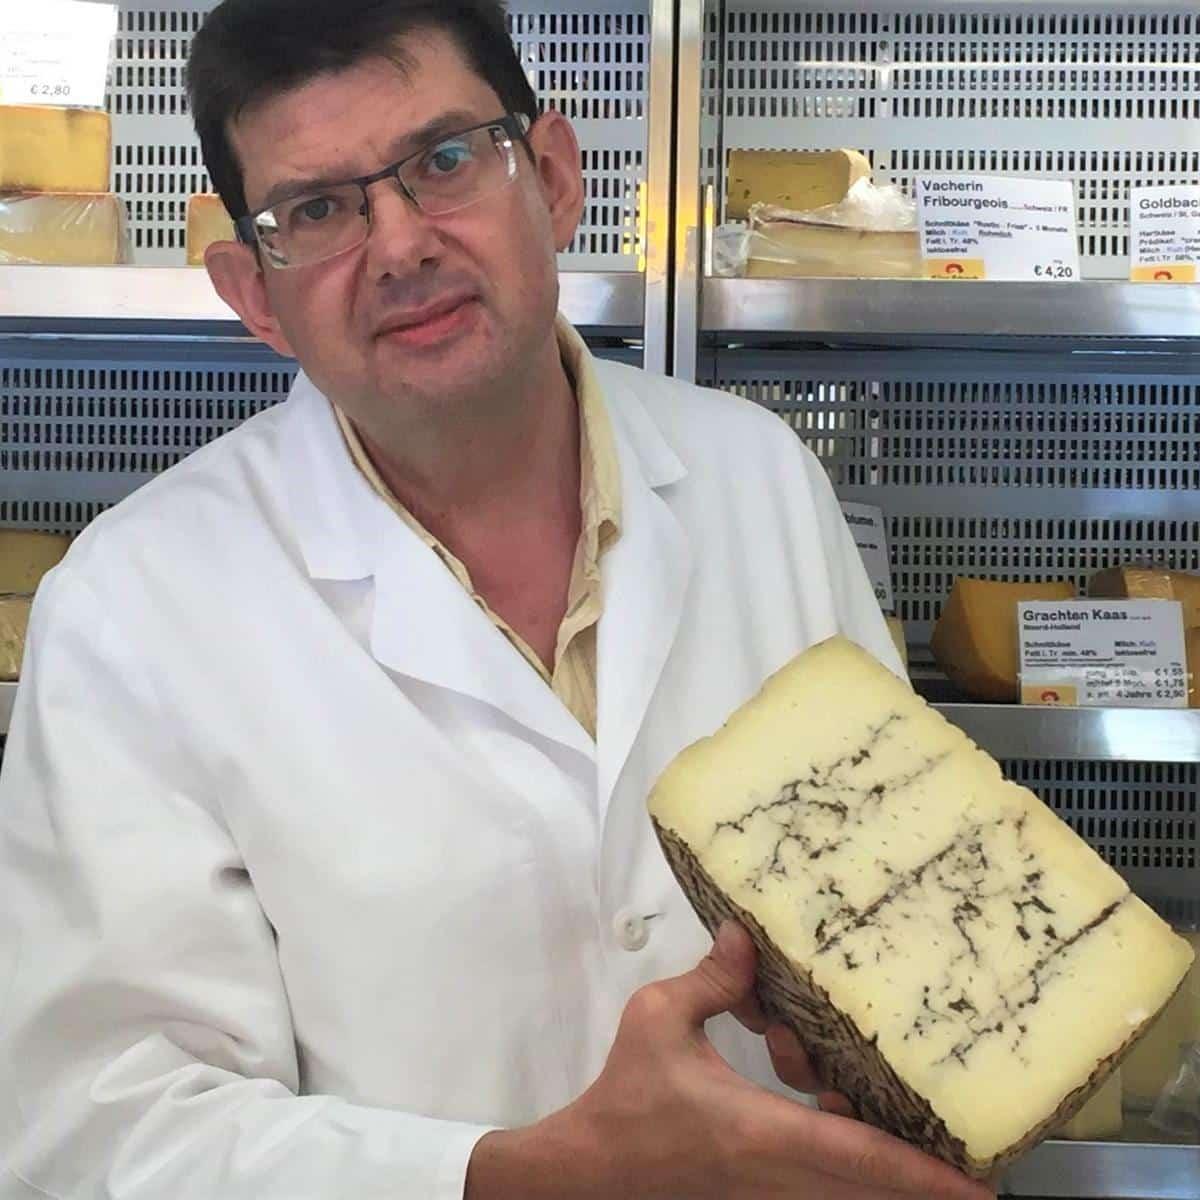 style hannover kaese schaub 8 - Käse-Schaub - Käse voller Tradition